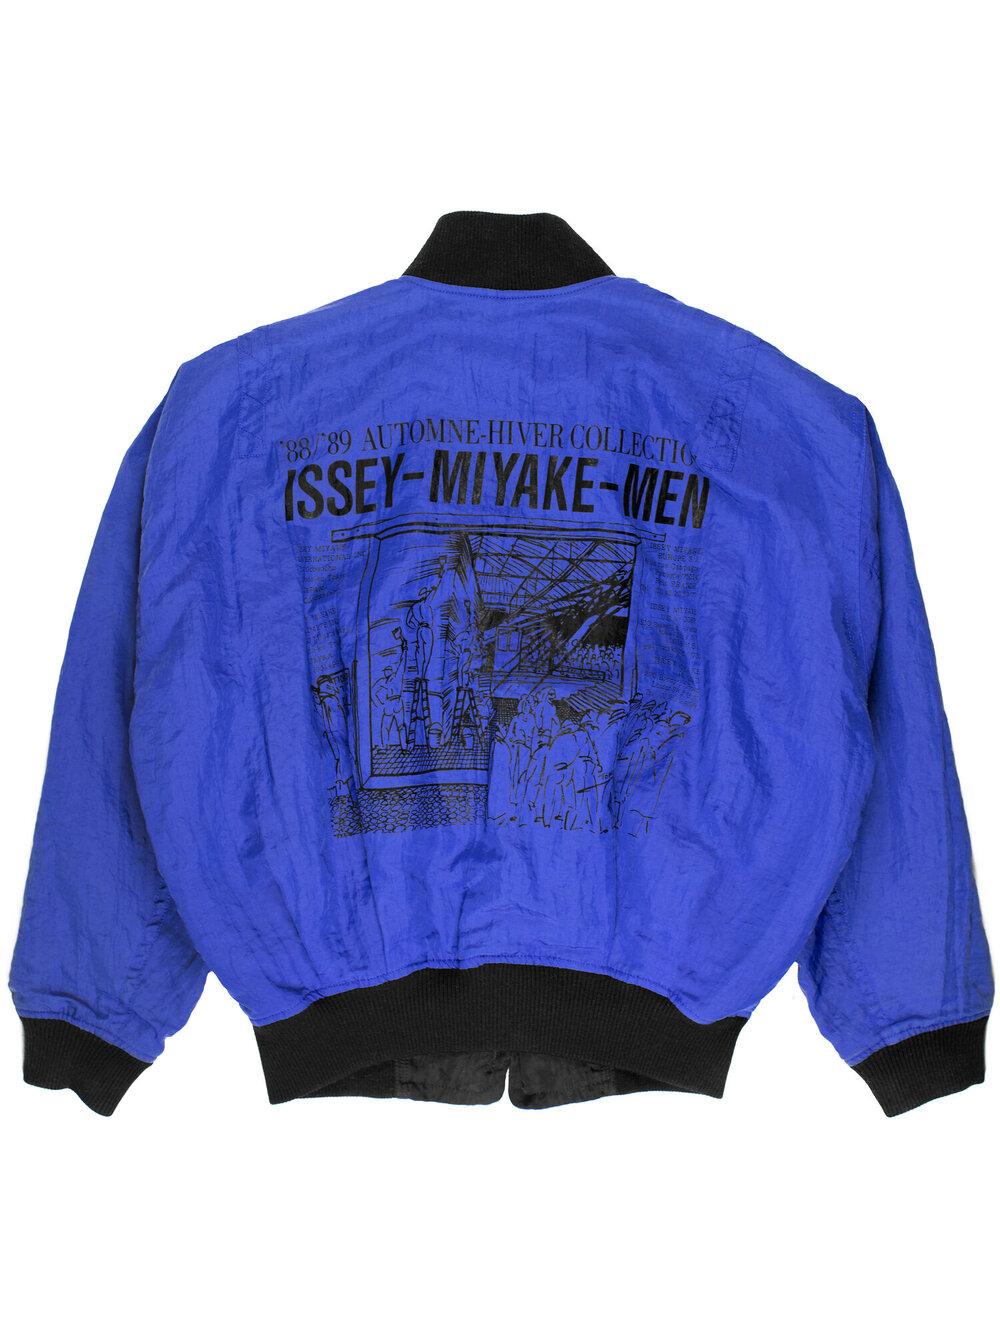 Issey Miyaki Jacket